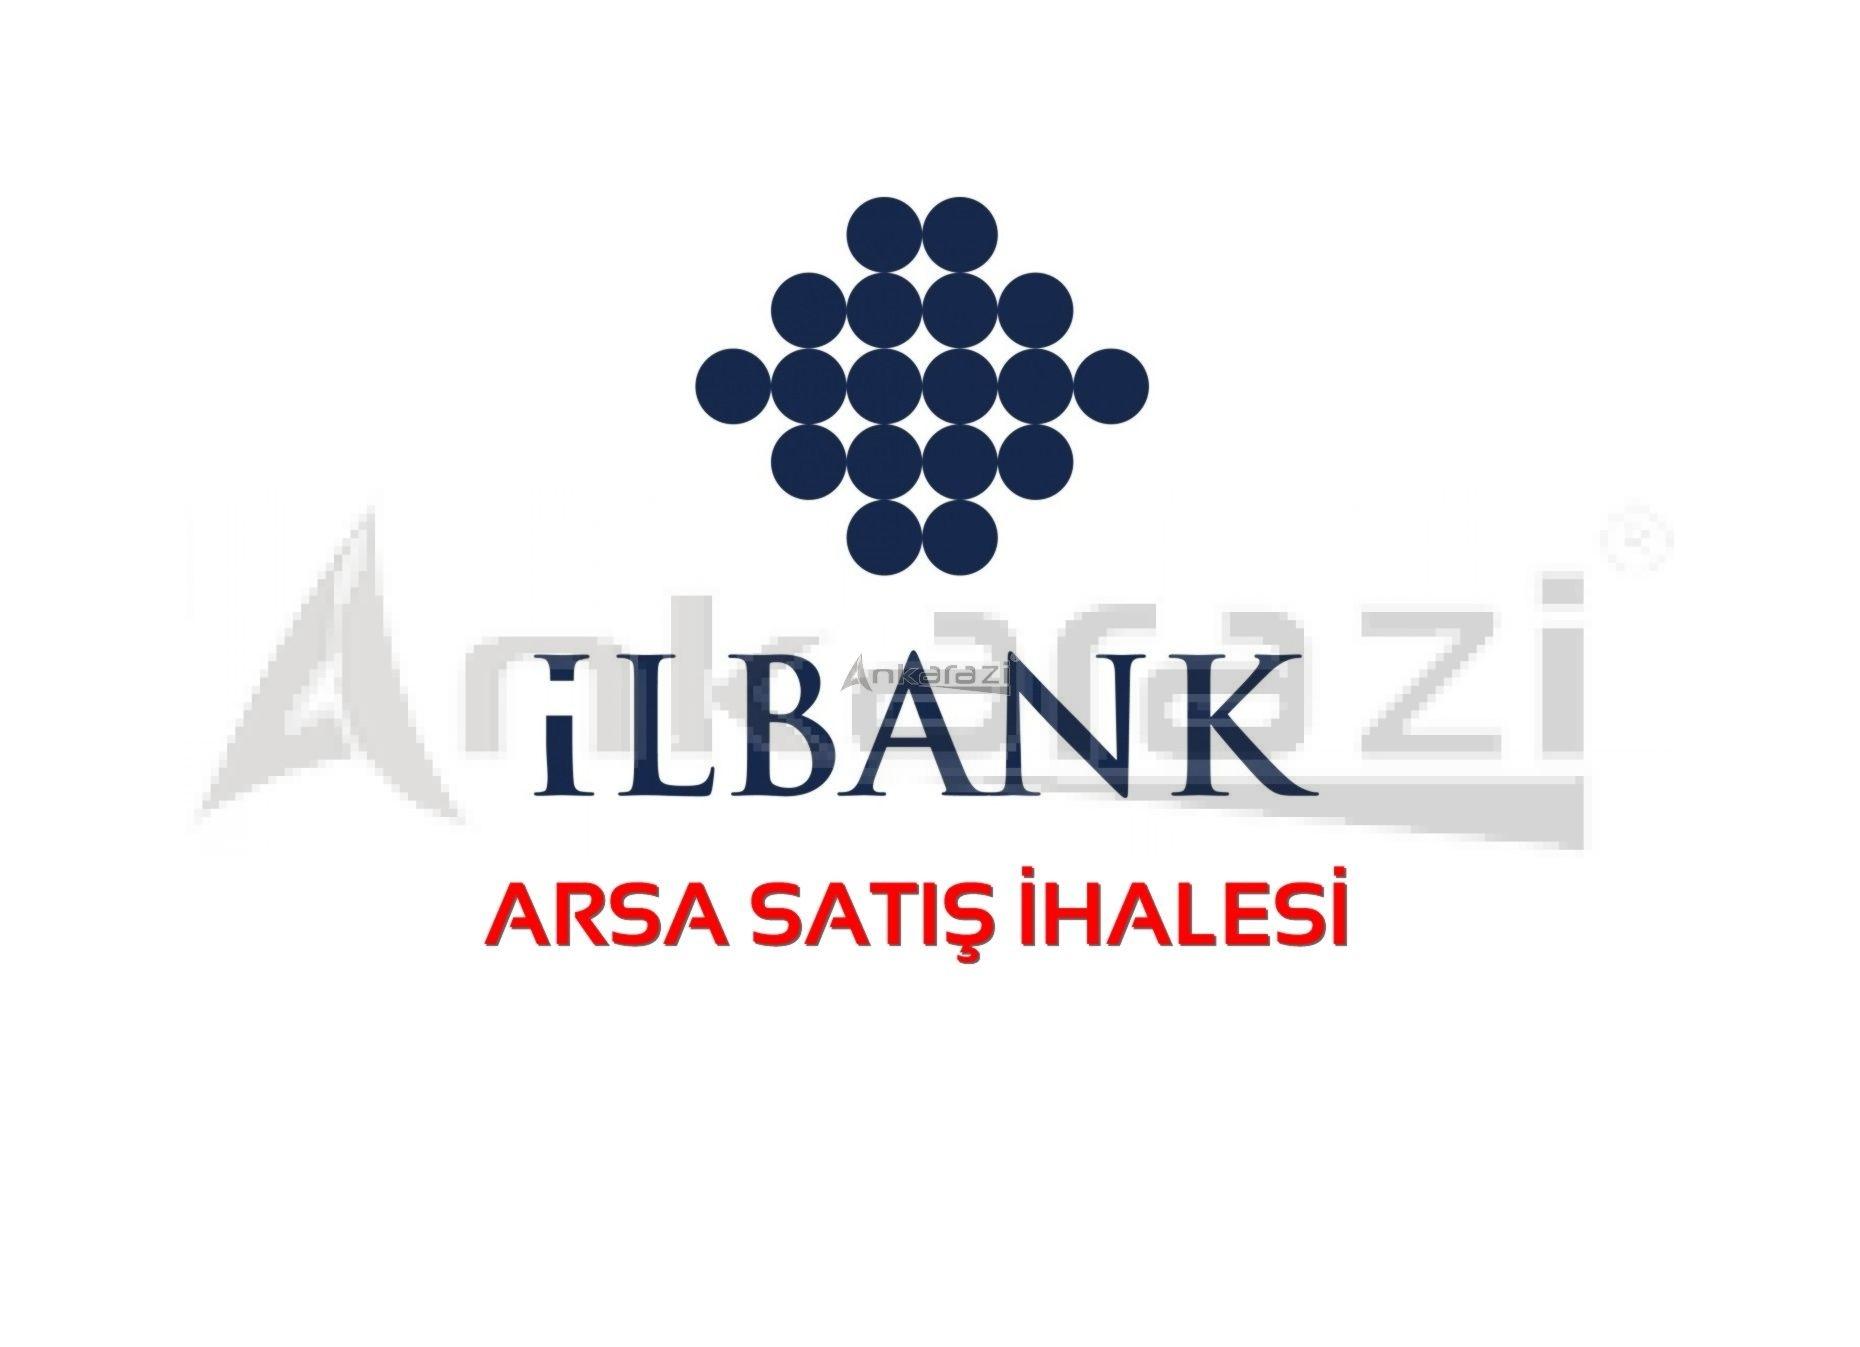 İlbank Arsa Satış İhalesi… (05.09.2019)